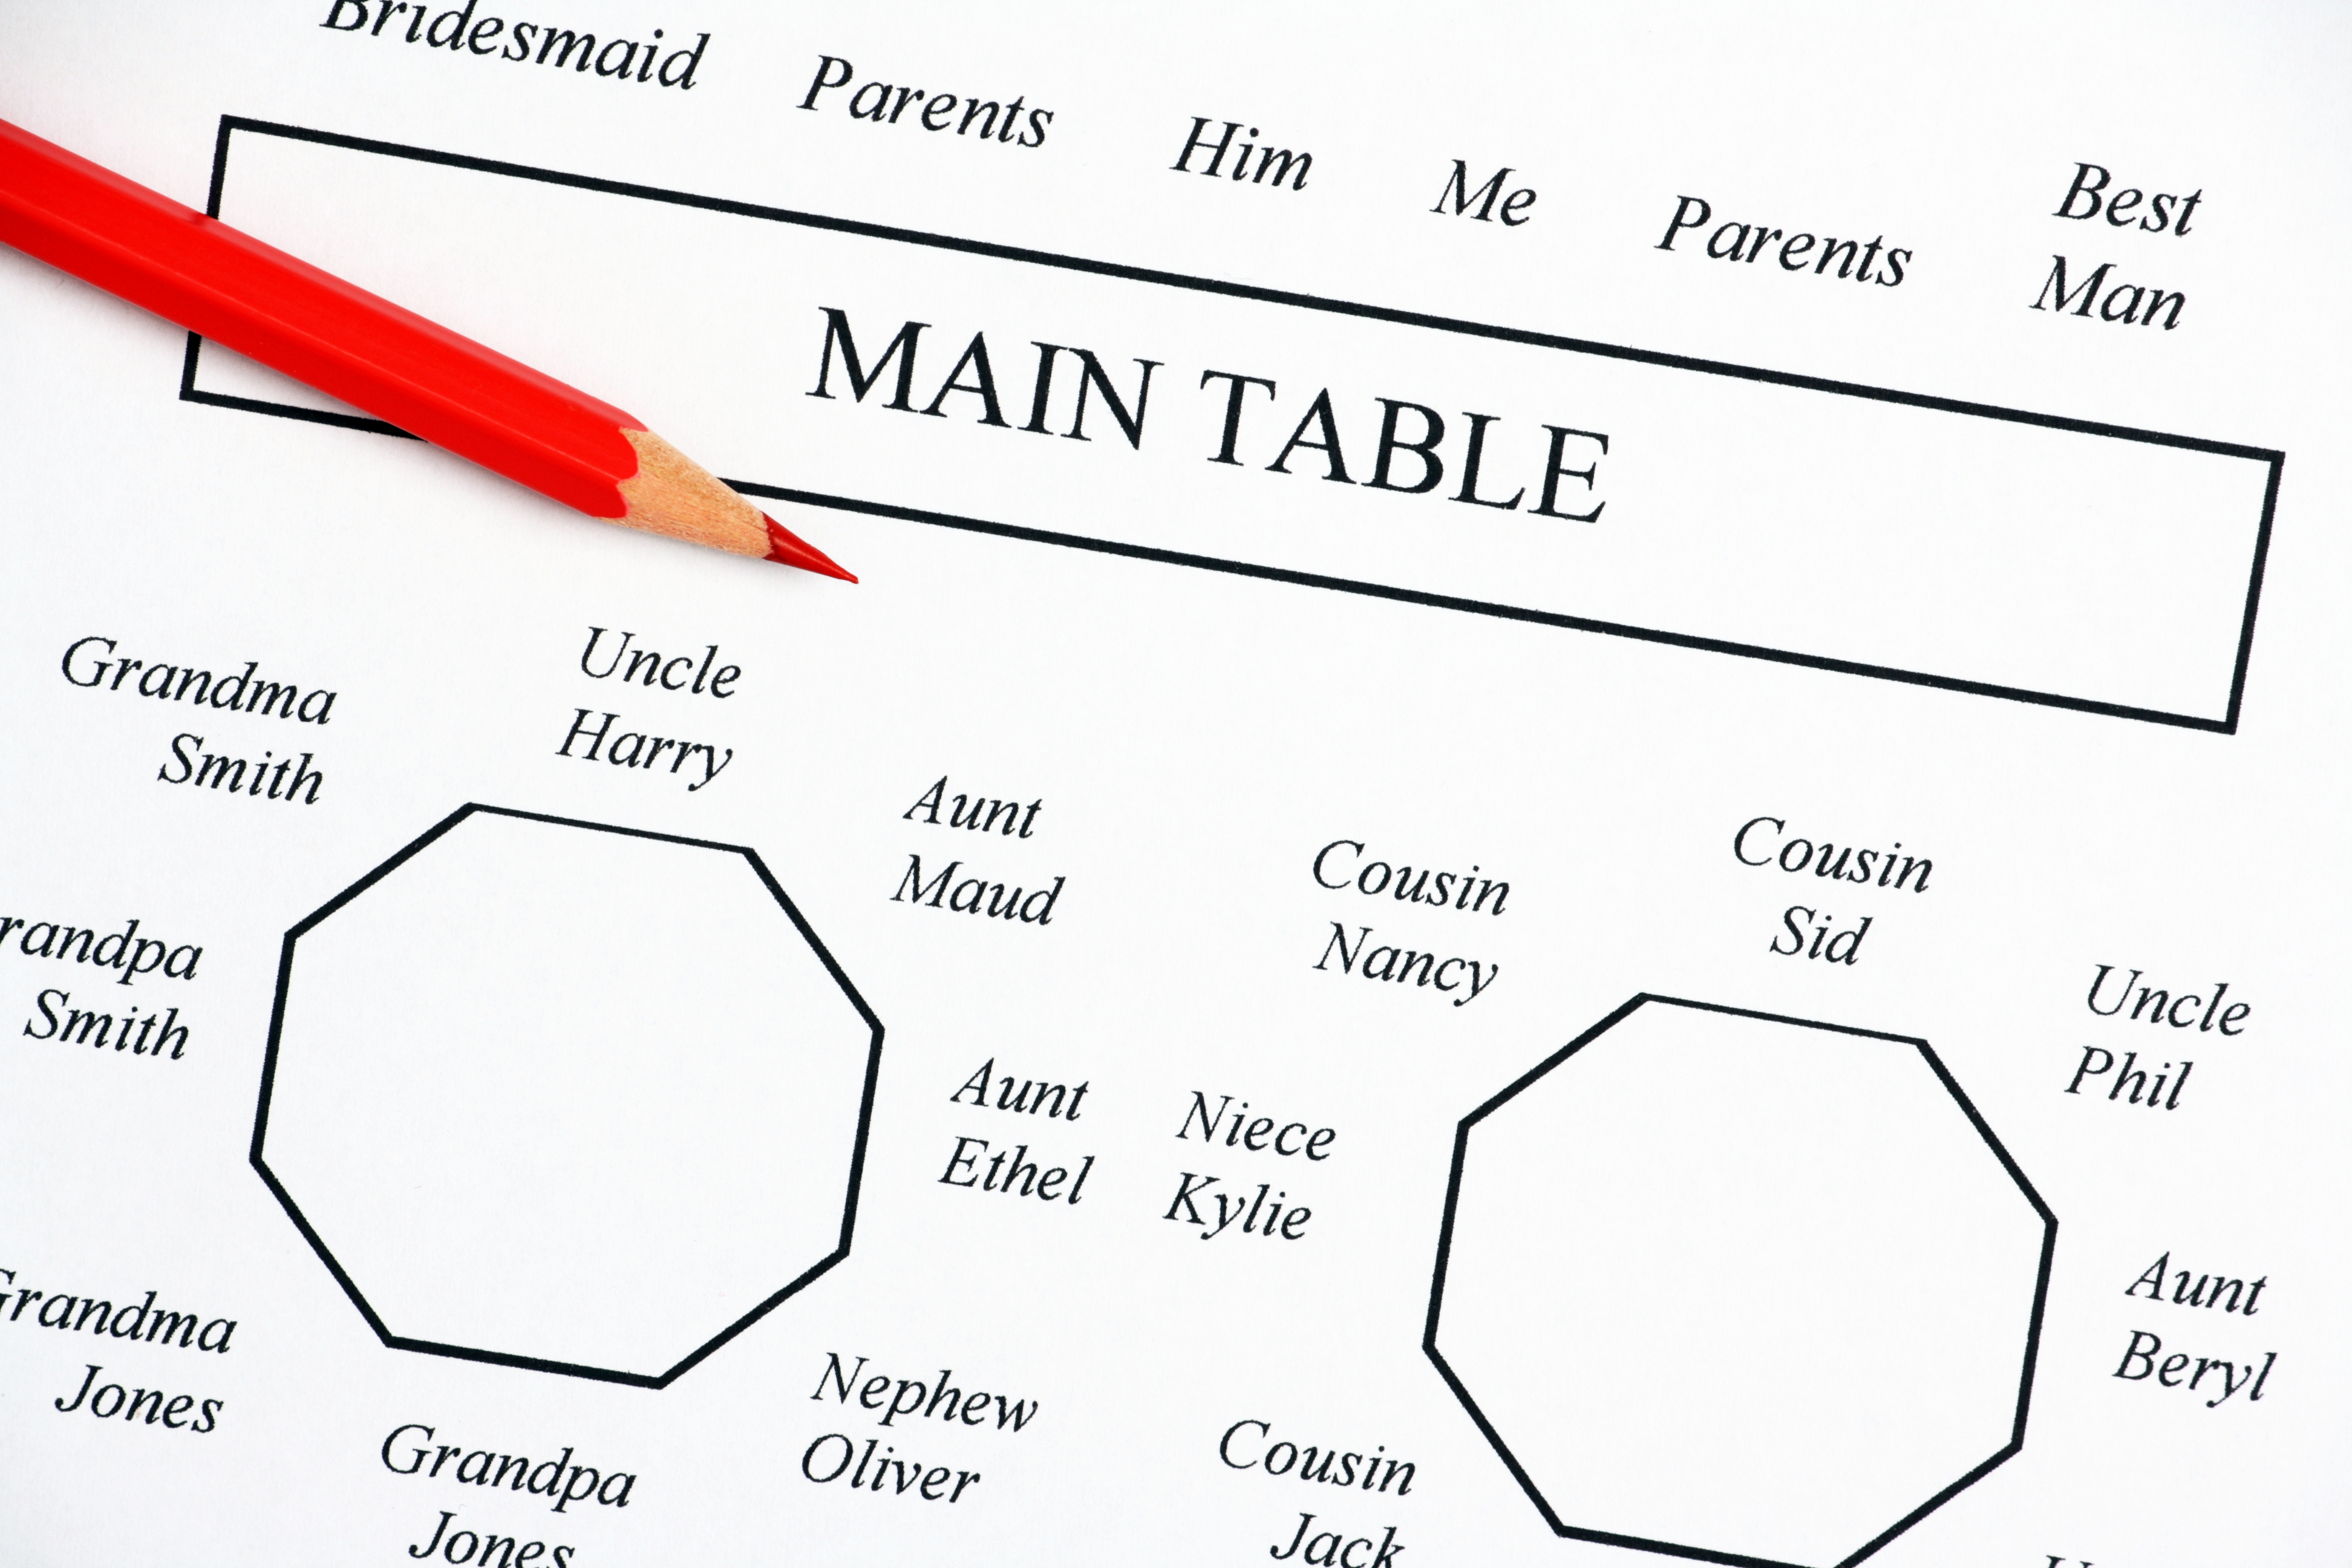 Wedding etiquette seatin charts guide planning wedding seating chart junglespirit Choice Image